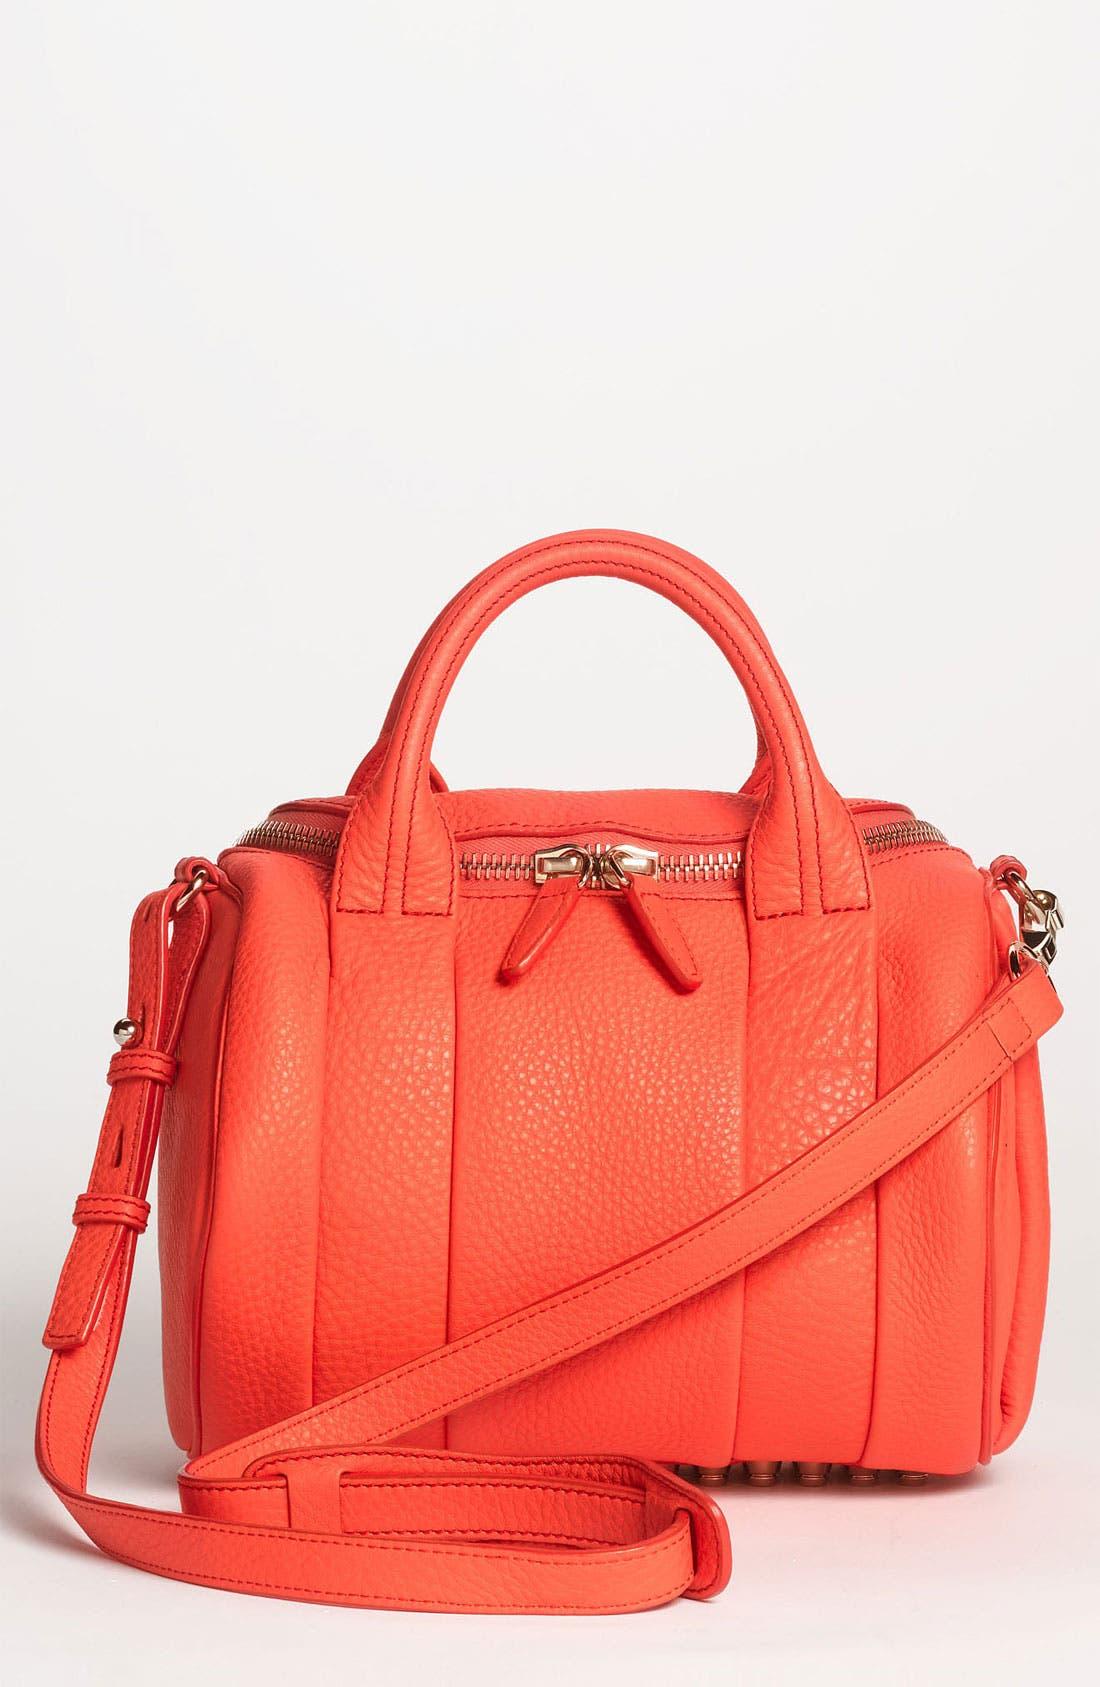 Main Image - Alexander Wang 'Rockie' Leather Satchel